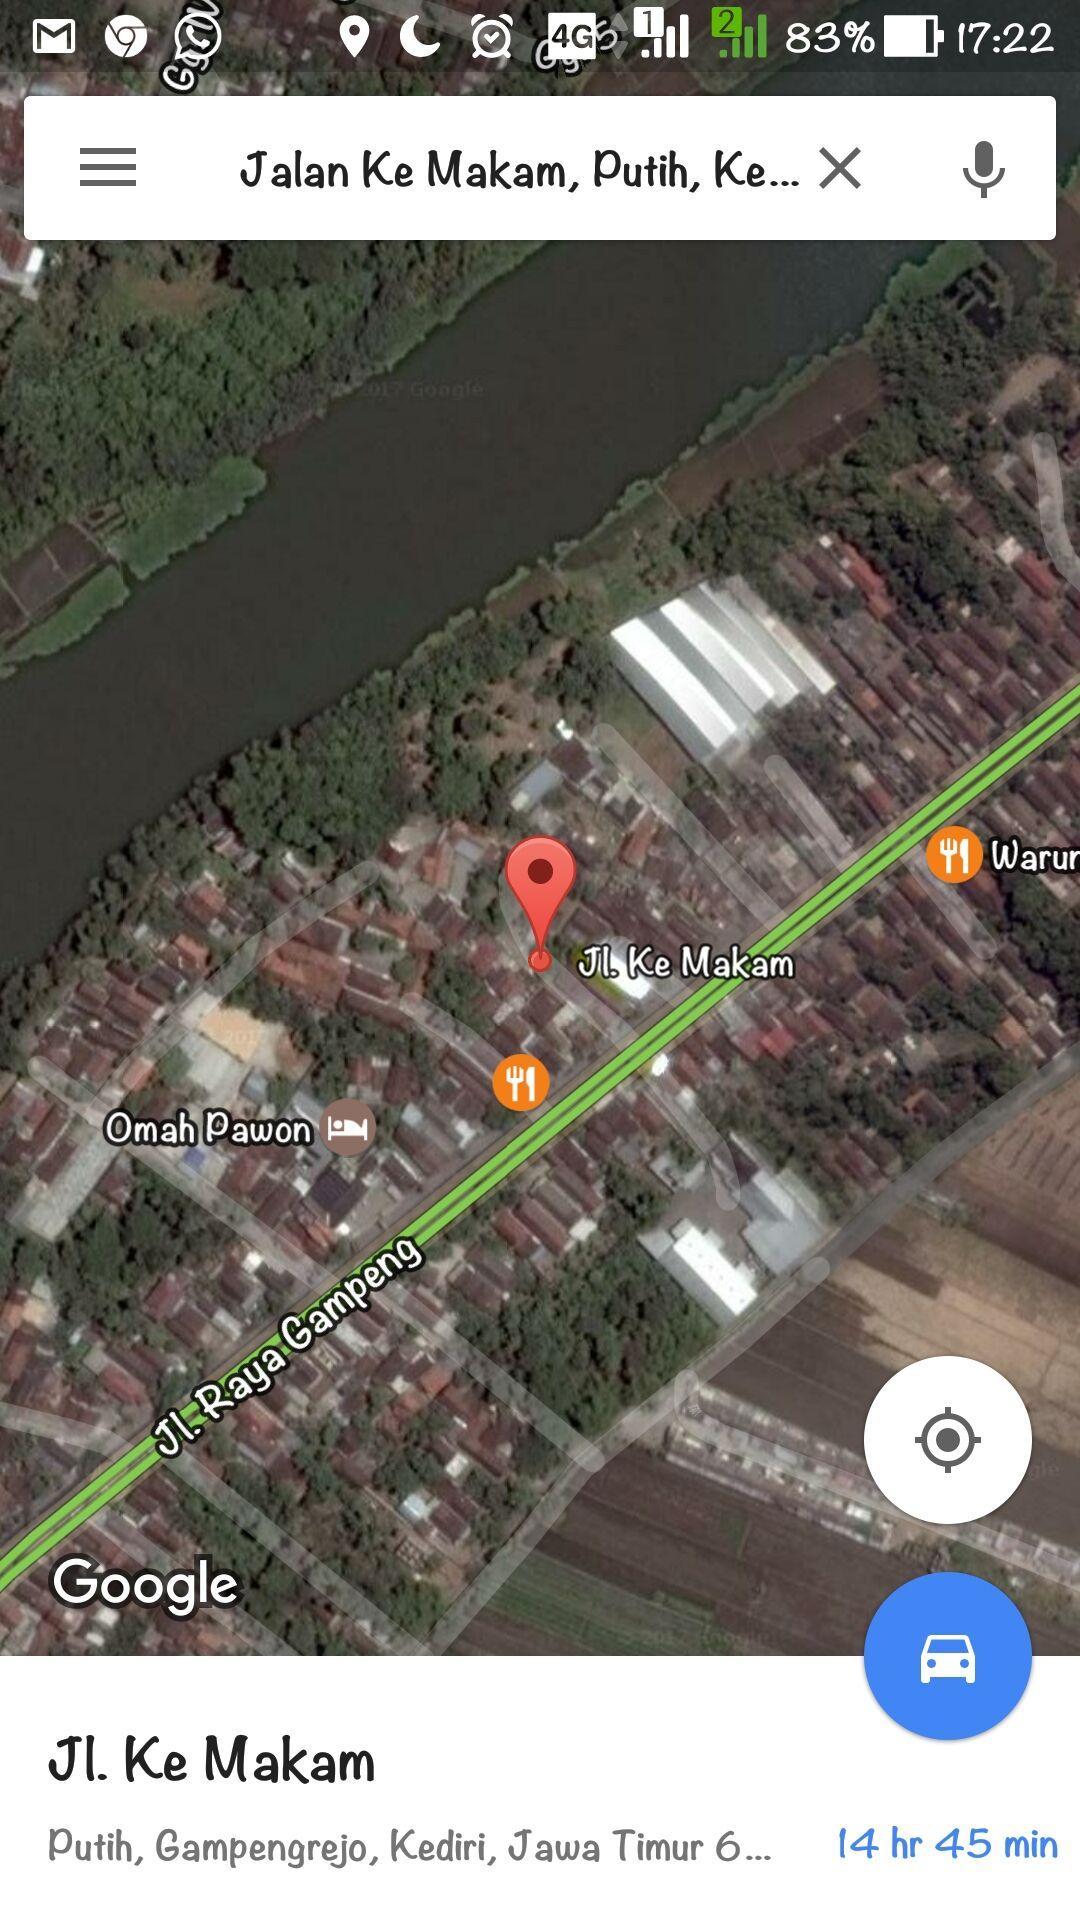 Nama Jalan Aneh Di Google Maps 3